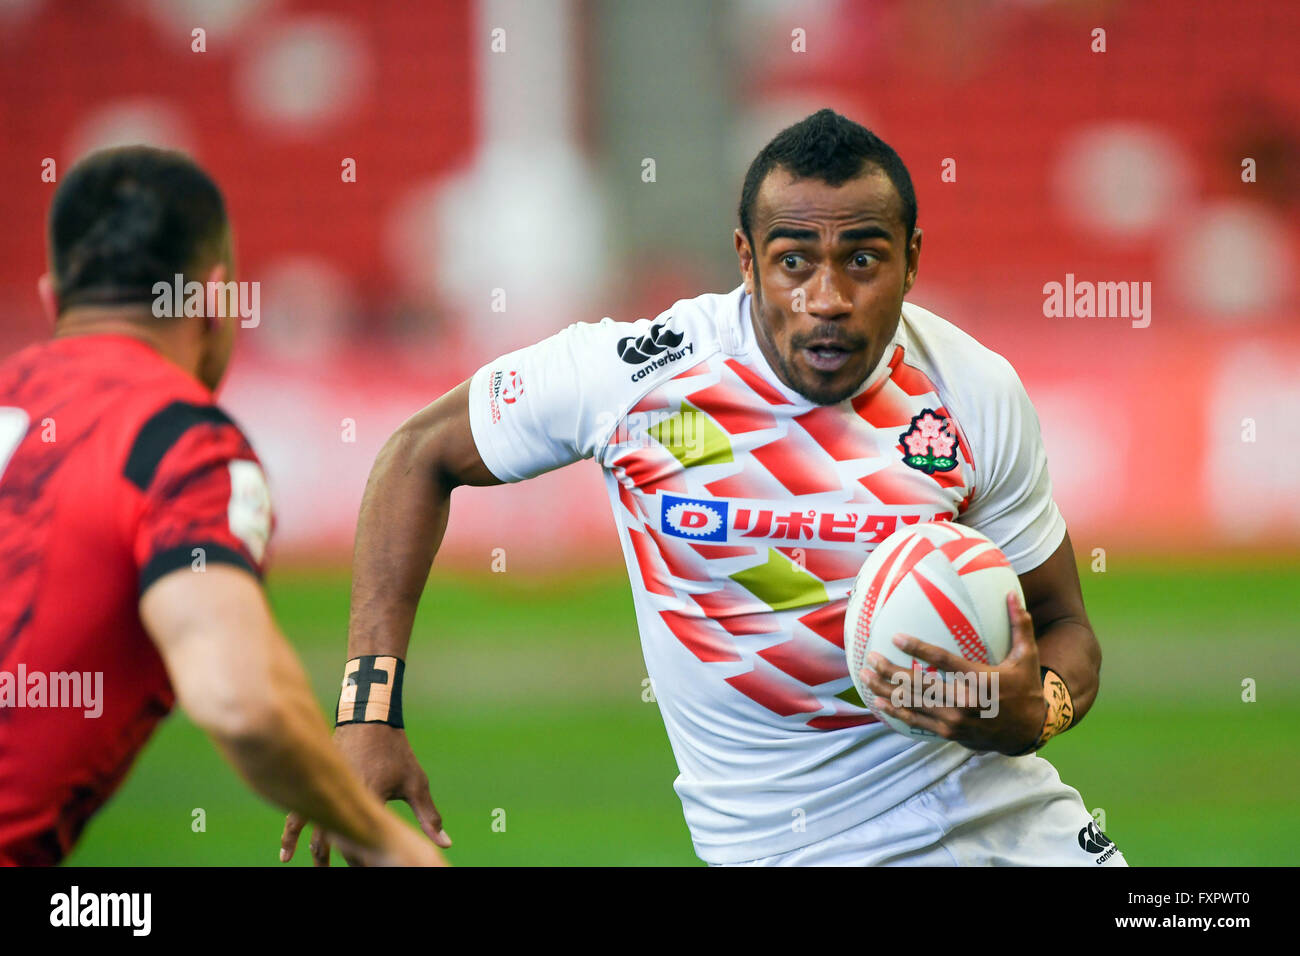 Kameli Soejima (JPN), APRL 16, 2016 - Rugby: HSBC Sevens World Series, Singapore Sevens Spiel Japan und Wales im Stockbild